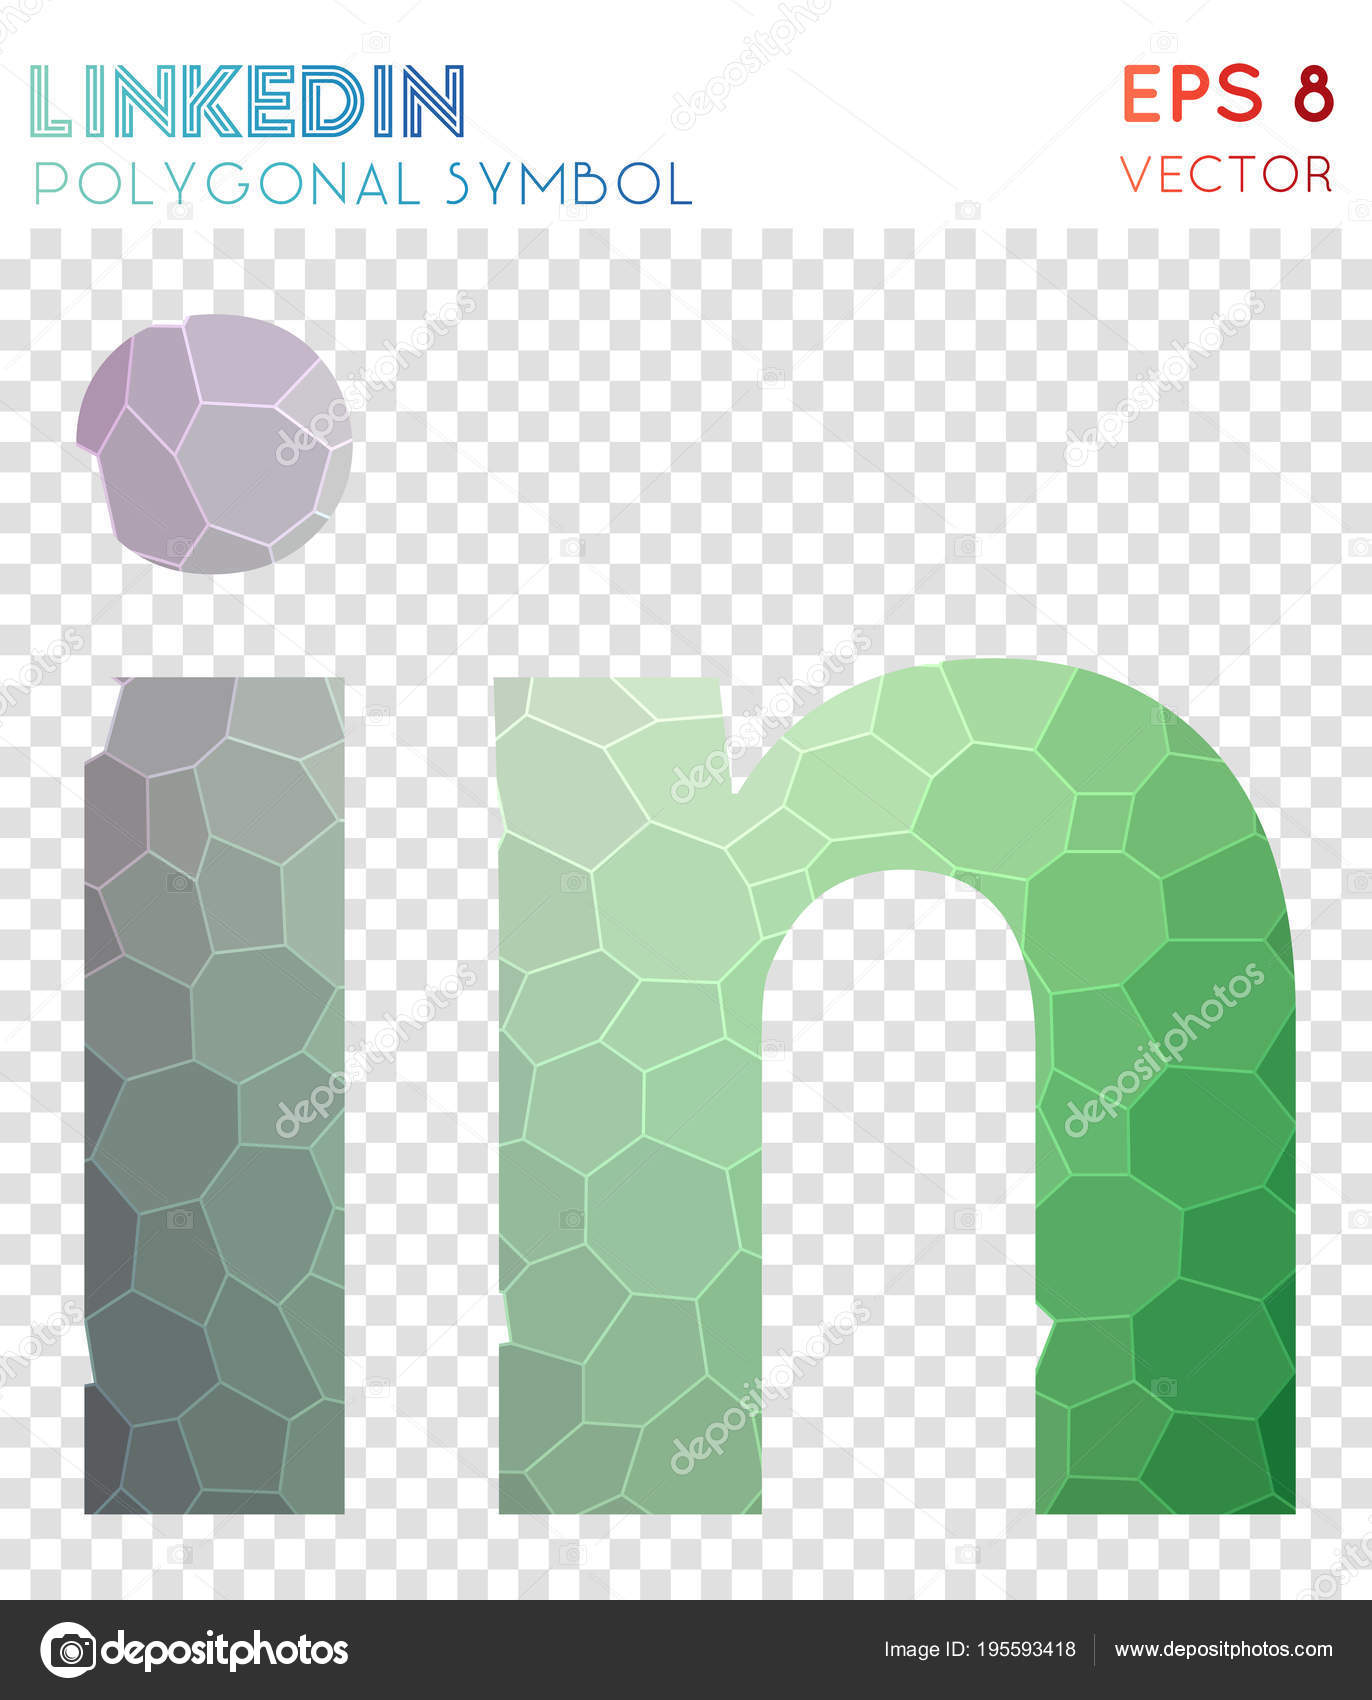 Linkedin Polygonal Symbol Artistic Mosaic Style Symbol Ravishing Low